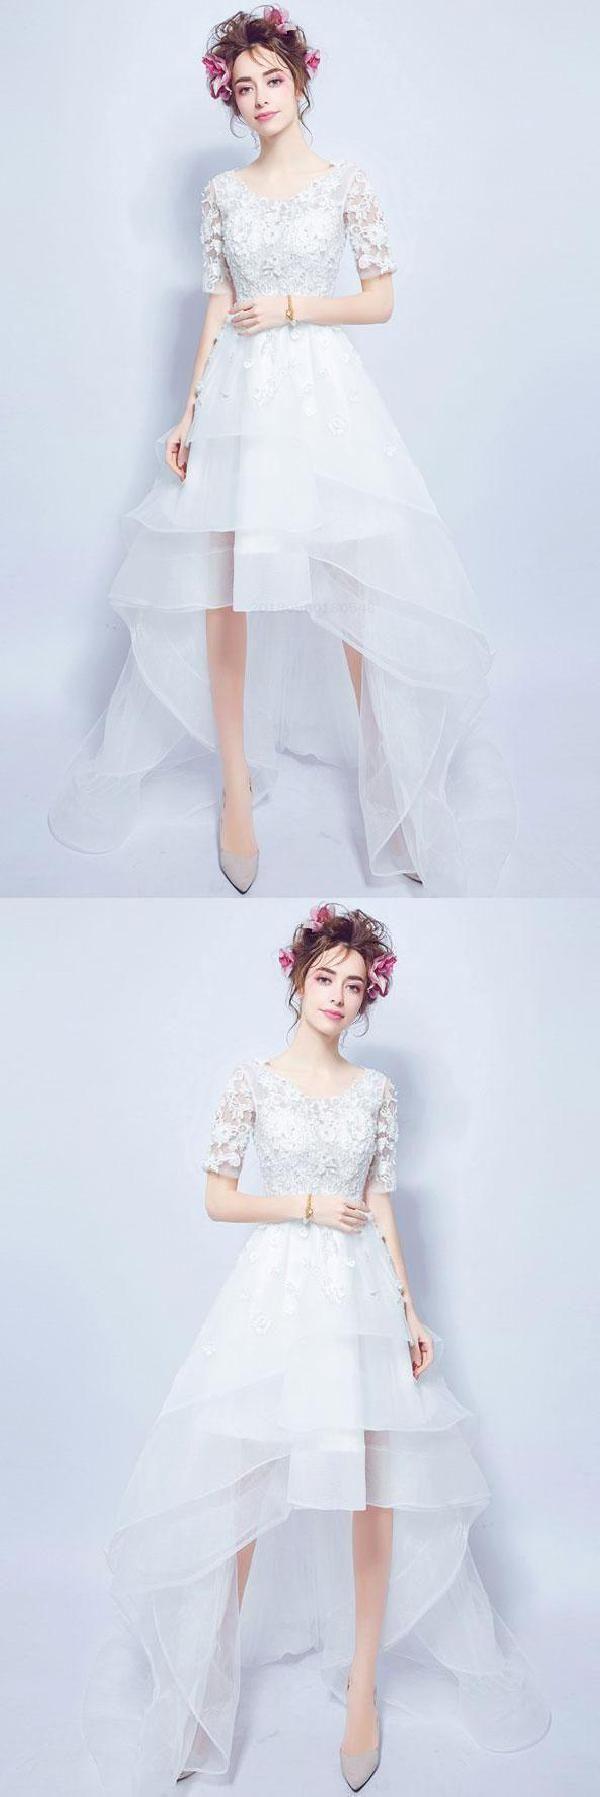 Lace white prom dresses white prom dresses lace prom dresses